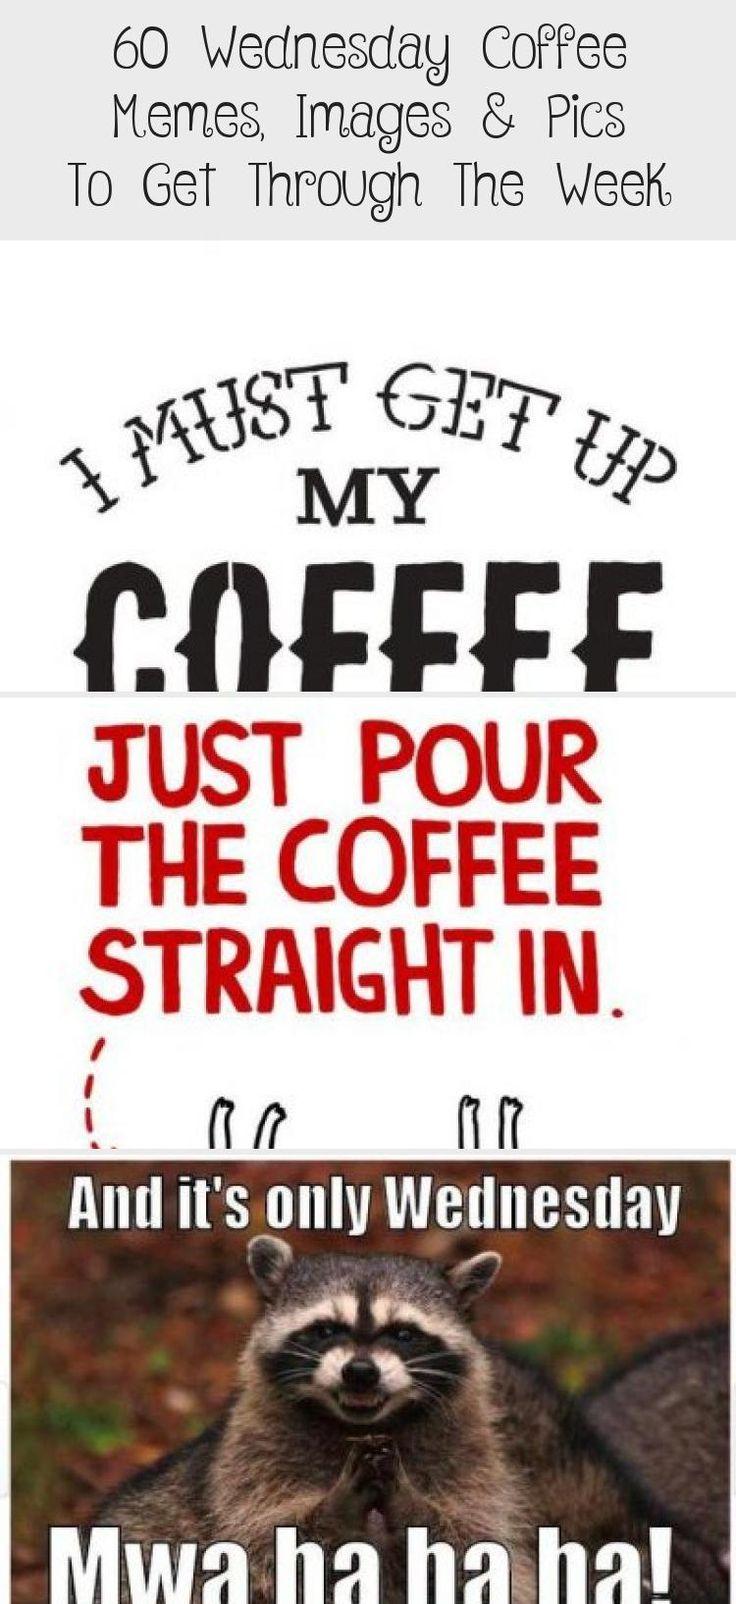 Wednesday Coffee Meme Funny